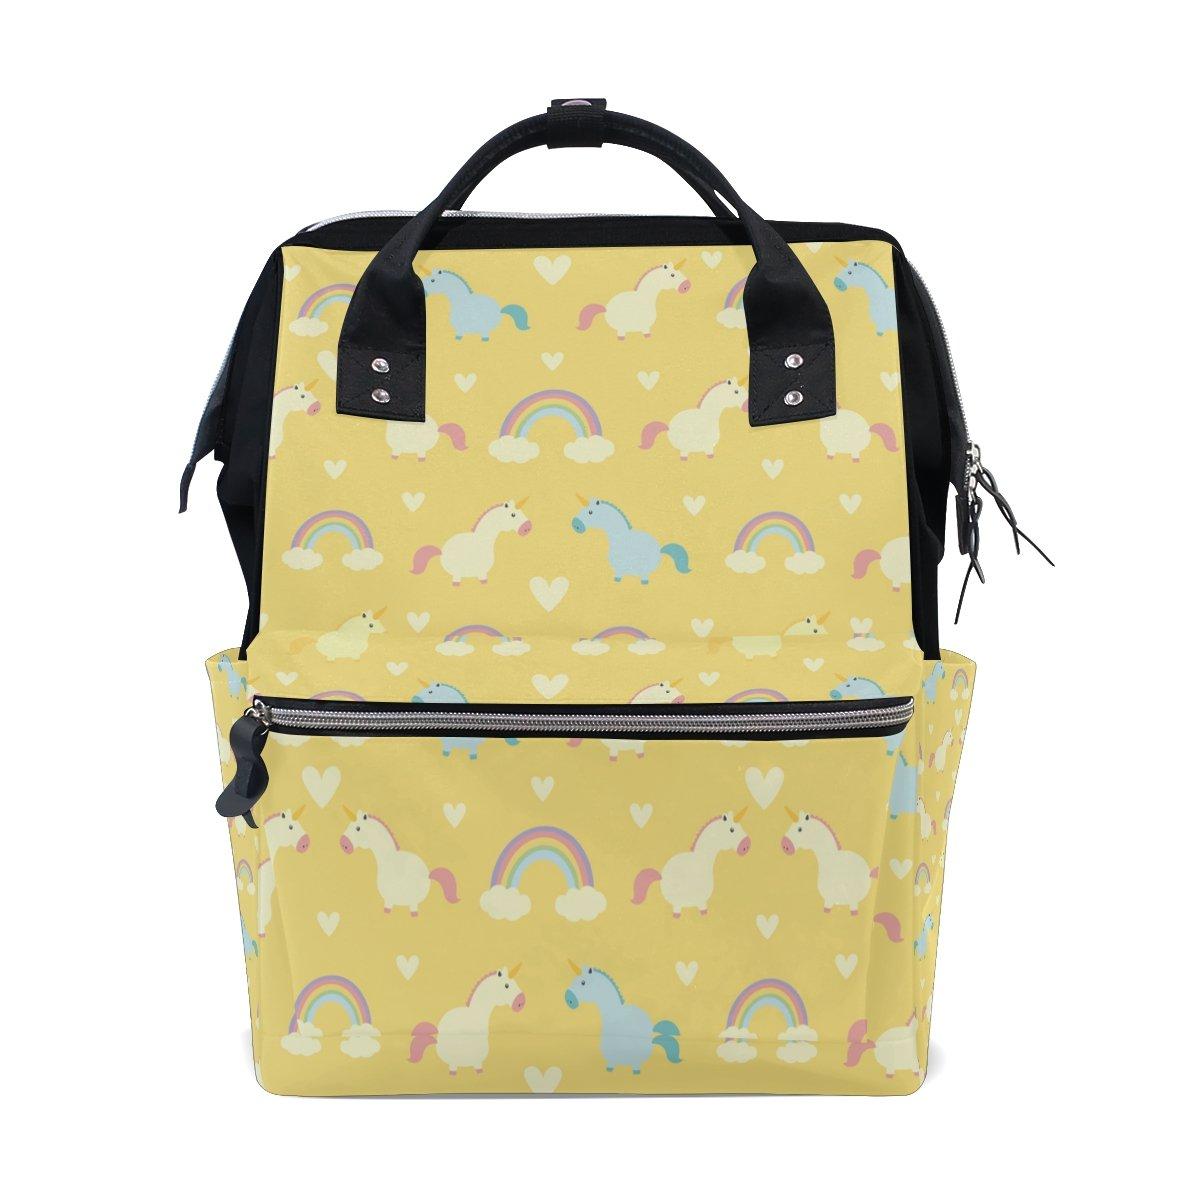 FENNEN Rainbow Unicorn Travel School Backpack Casual College Lightweight Laptop Backpack Large Capacity Shoulder Diaper Bag for Women Men